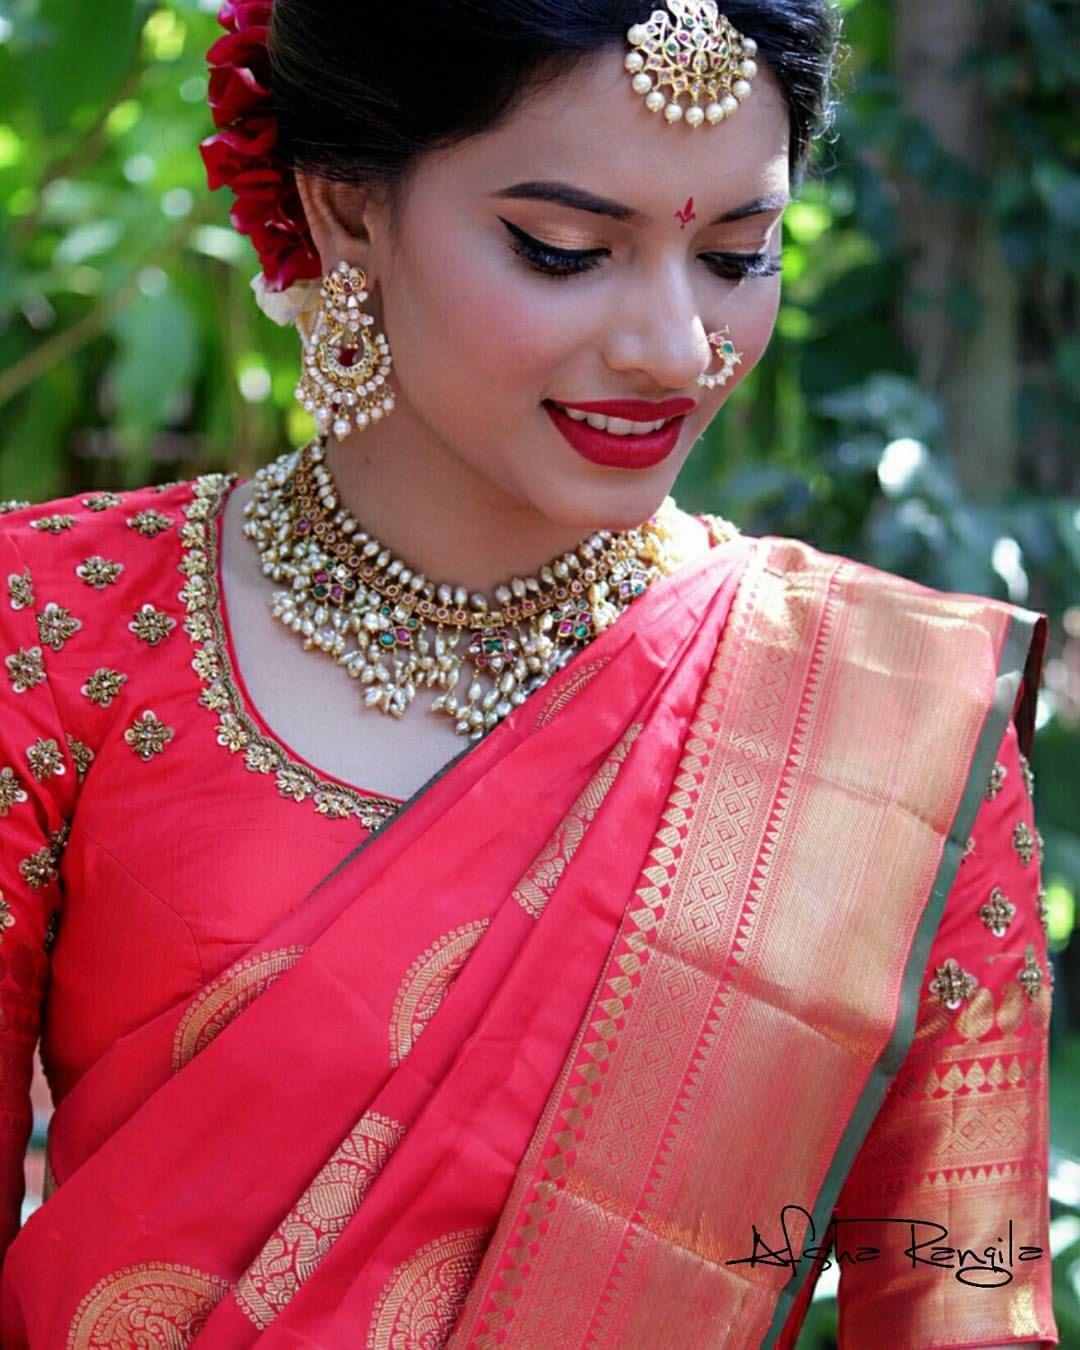 Pin de Sravani Puttagunta en Pelli | Pinterest | India y Tradicional